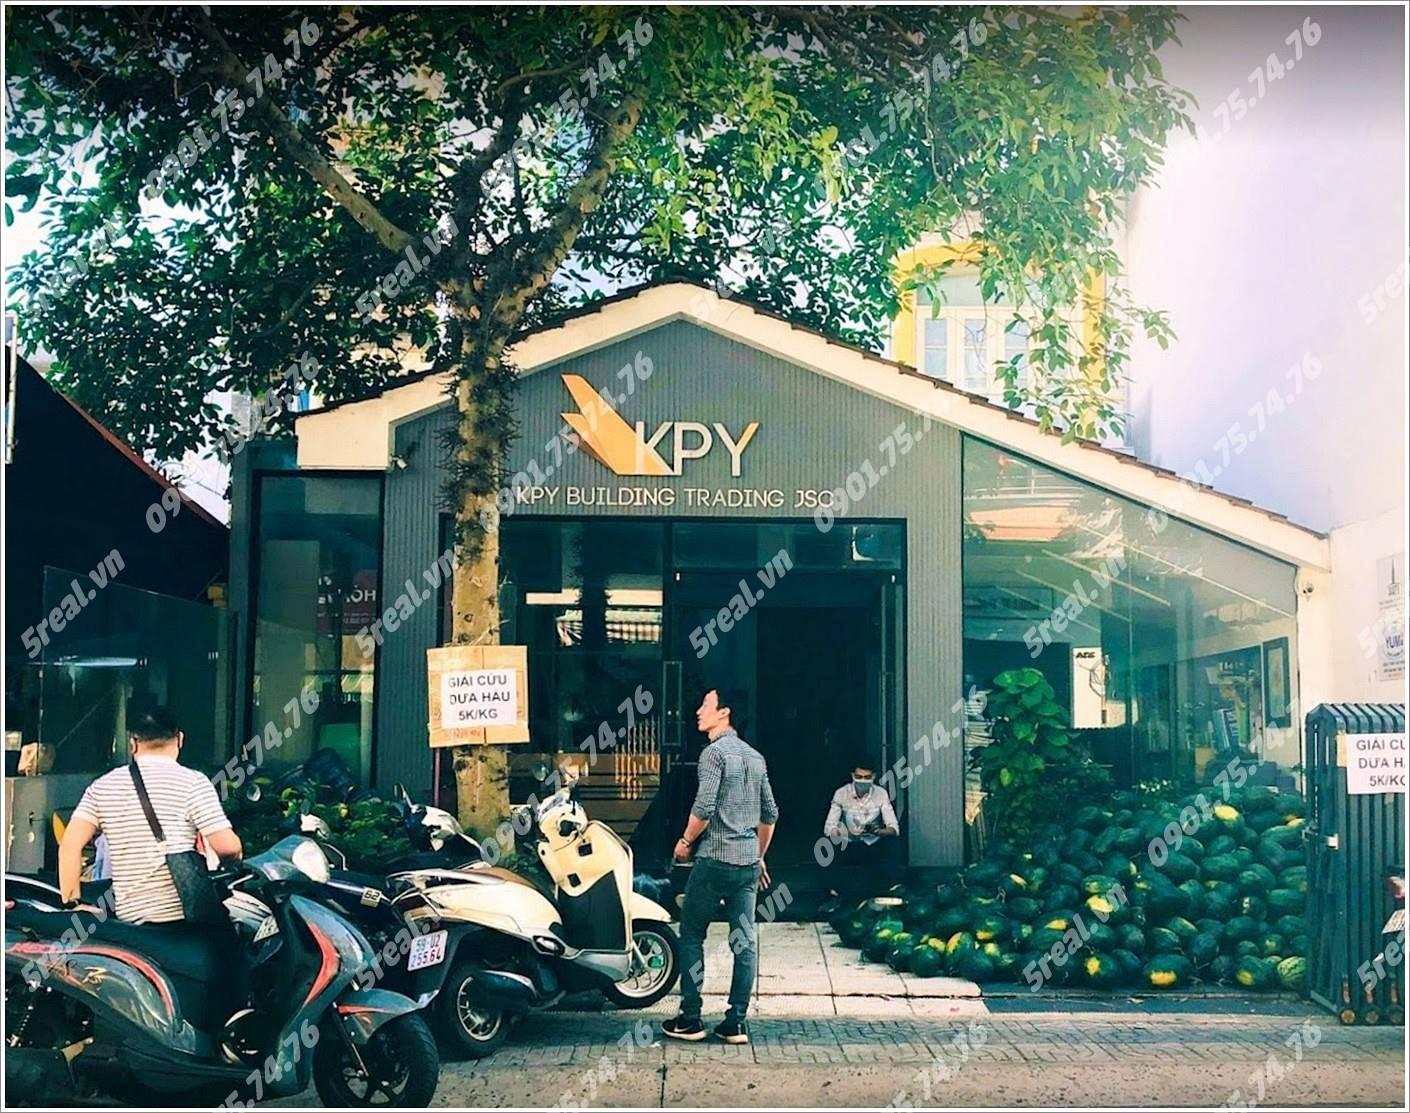 kpy-building-ho-hao-hon-quan-1-van-phong-cho-thue-5real.vn-01